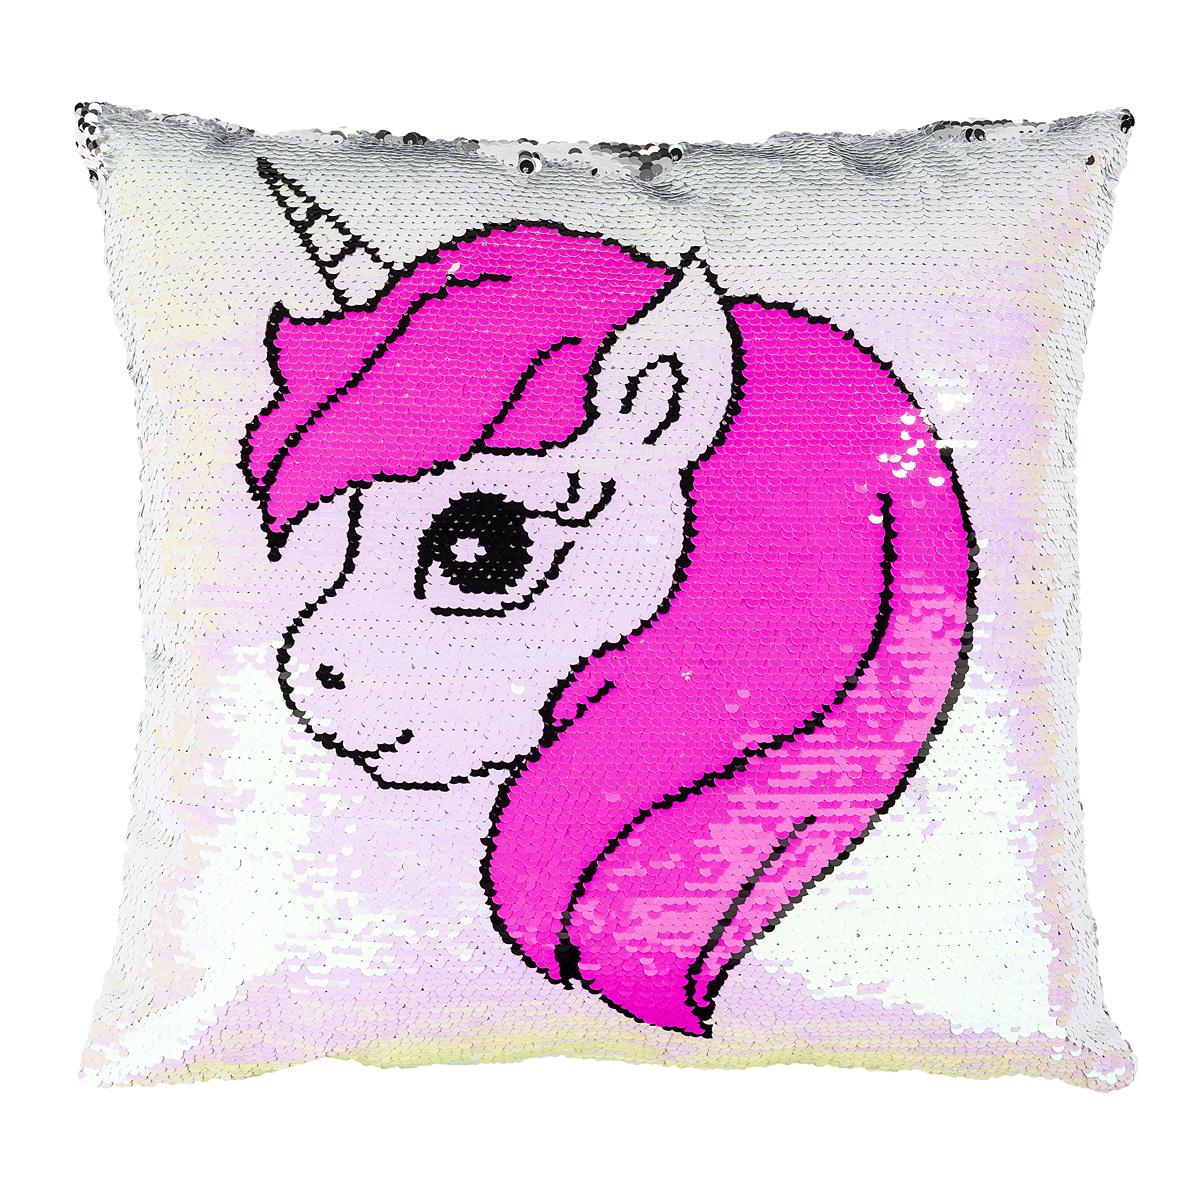 Pernuță Unicorn cu paiete, roz, 40 x 40 cm imagine 2021 e4home.ro